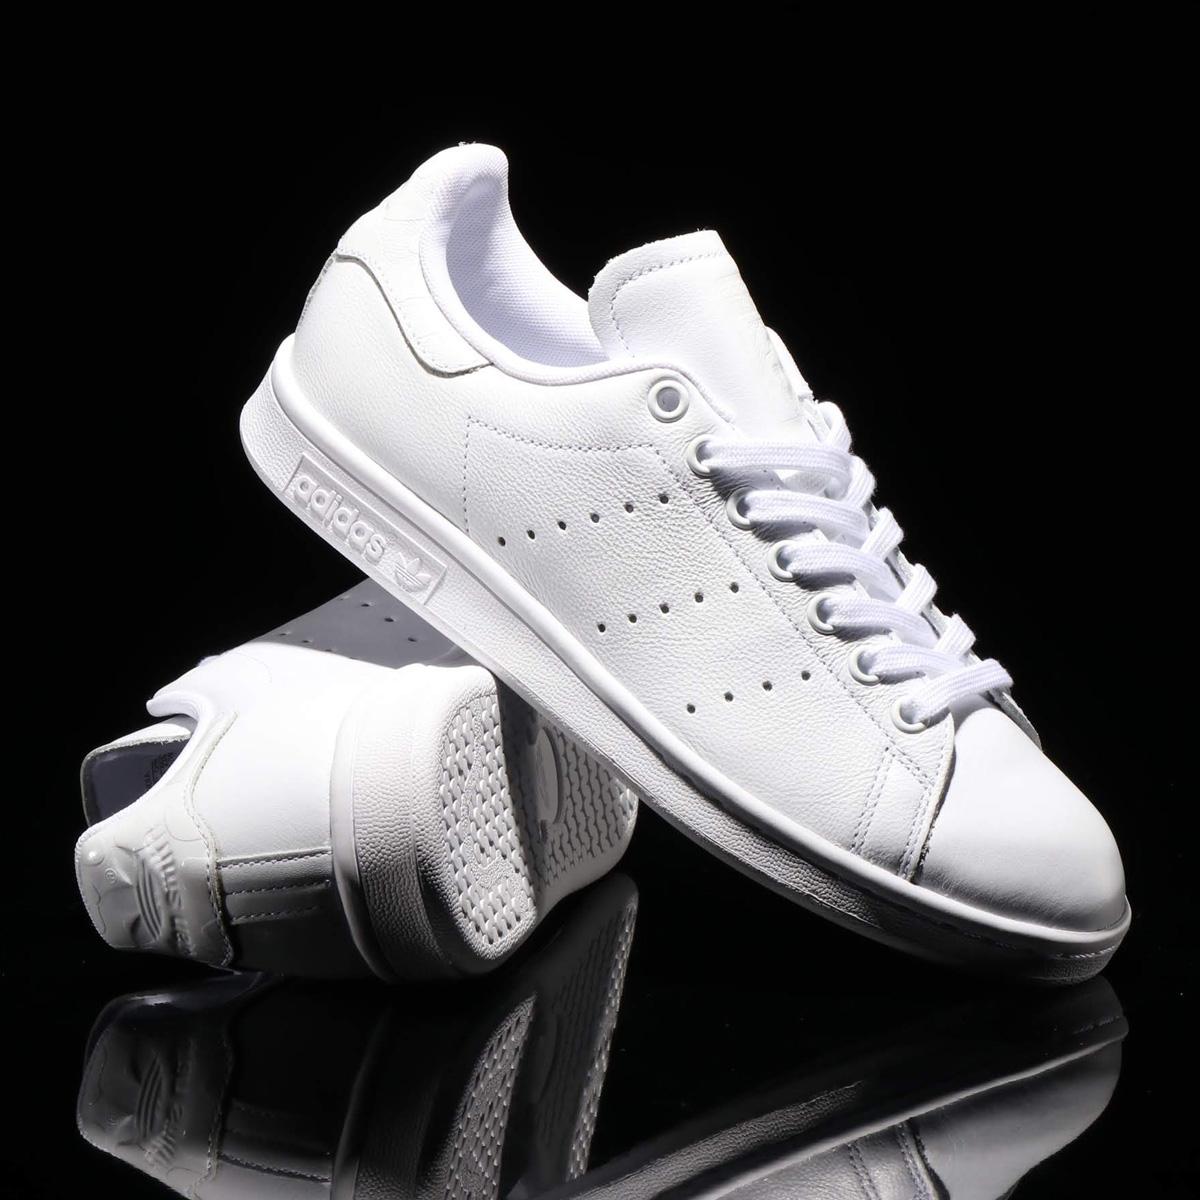 adidas Originals STAN SMITH W(アディダスオリジナルス スタンスミス W)RUNNING WHITE/CRYSTAL WHITE/CORE BLACK【メンズ レディース スニーカー】19FW-I